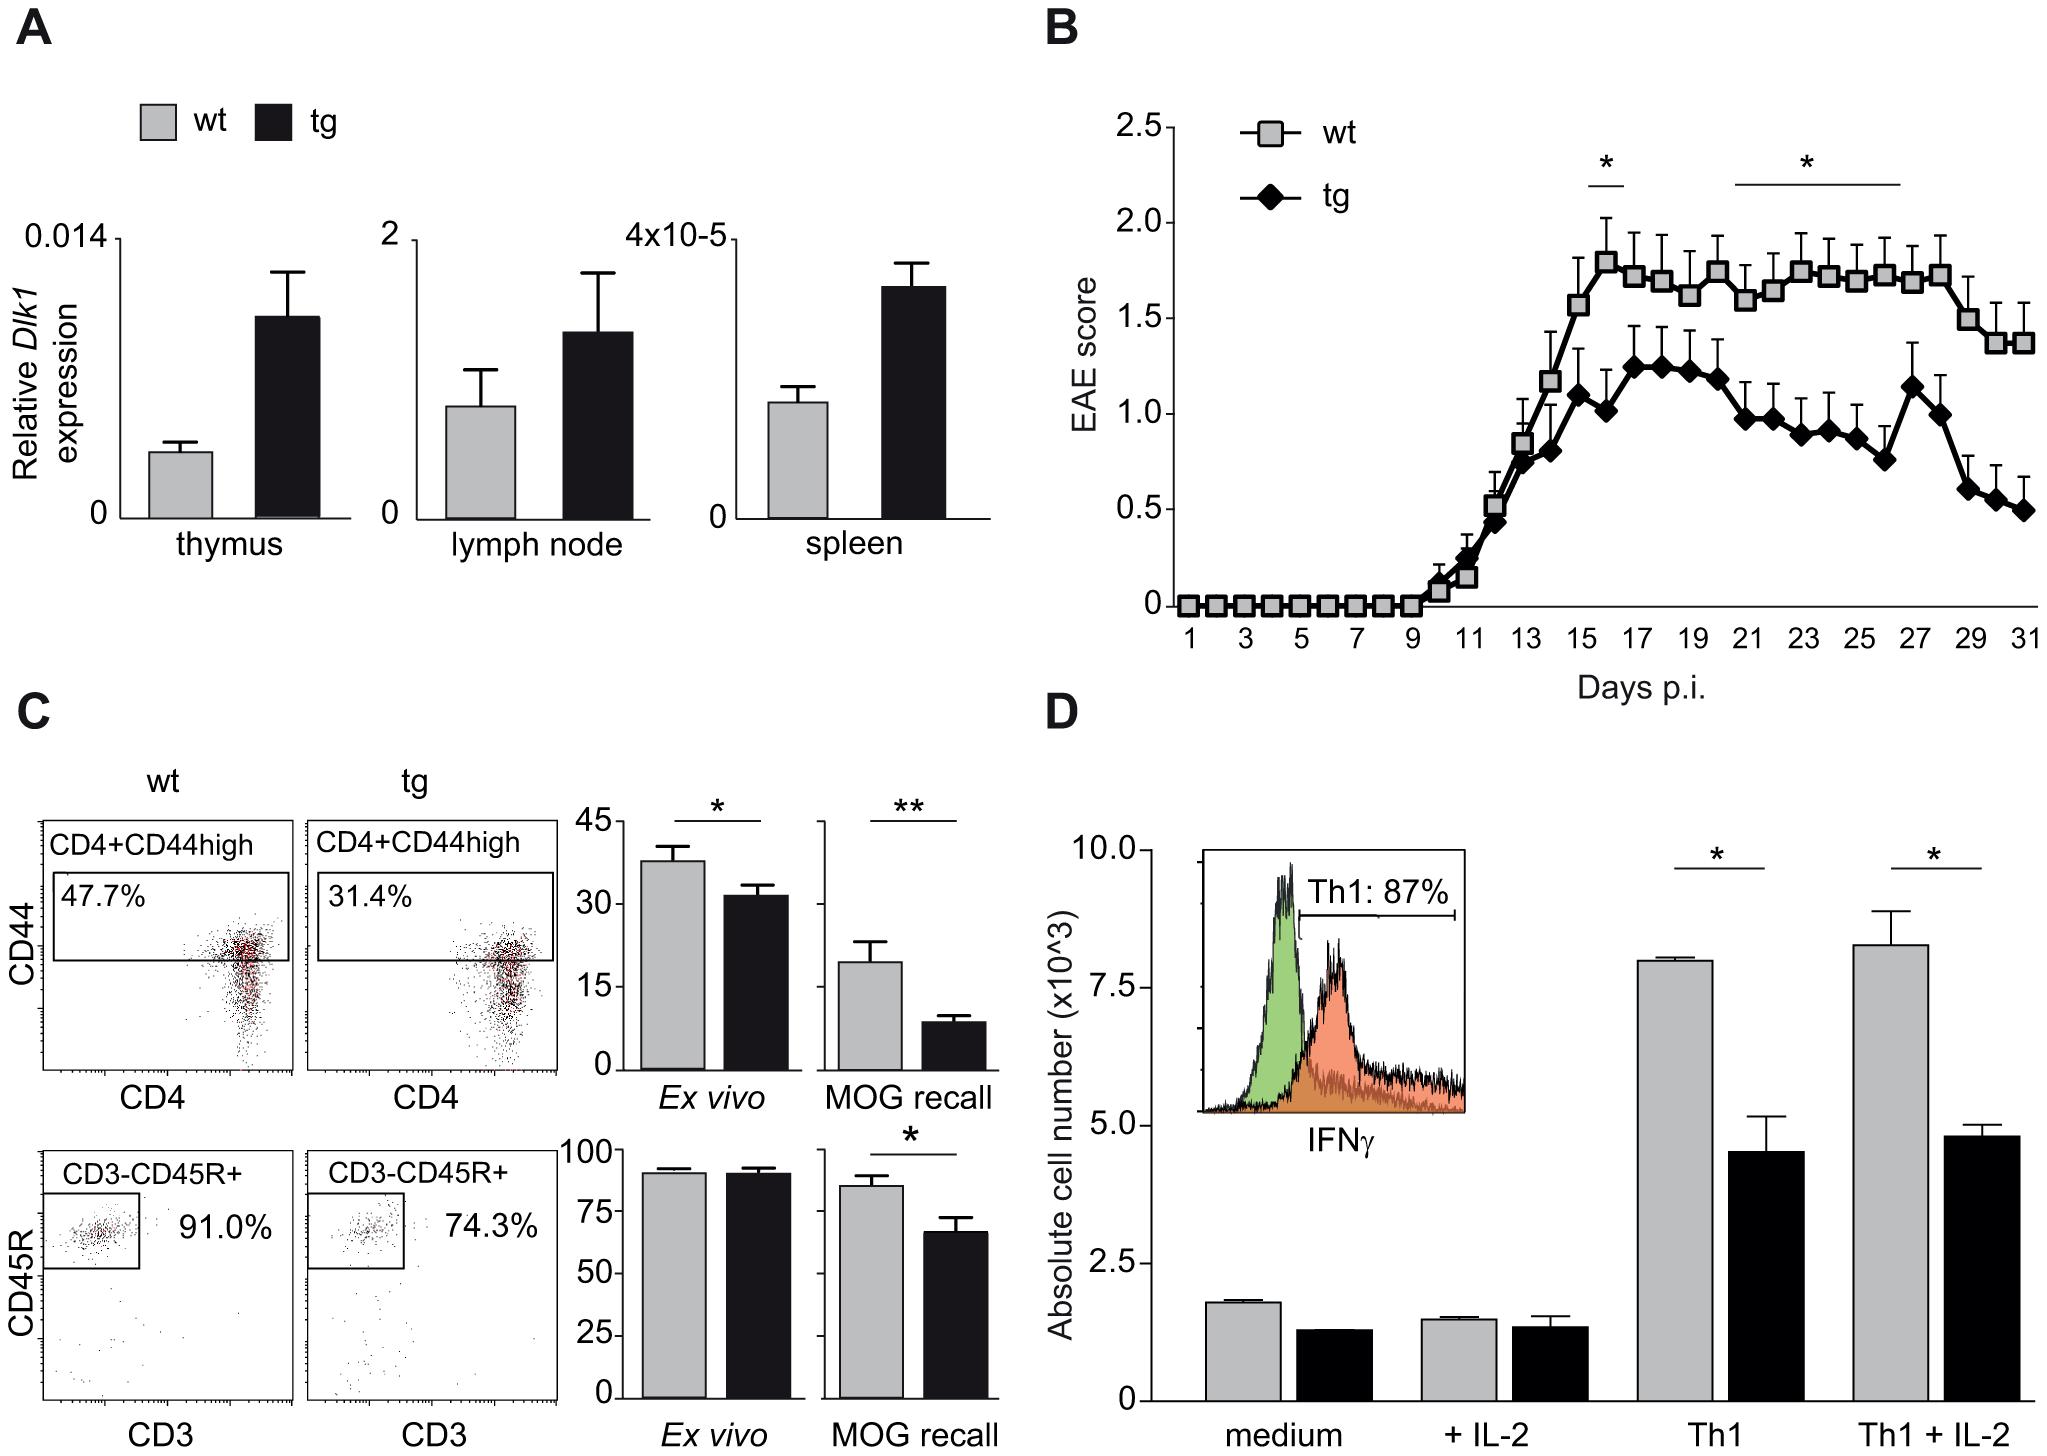 Transgenic overexpression of Dlk1 modulates EAE severity and adaptive immune responses.